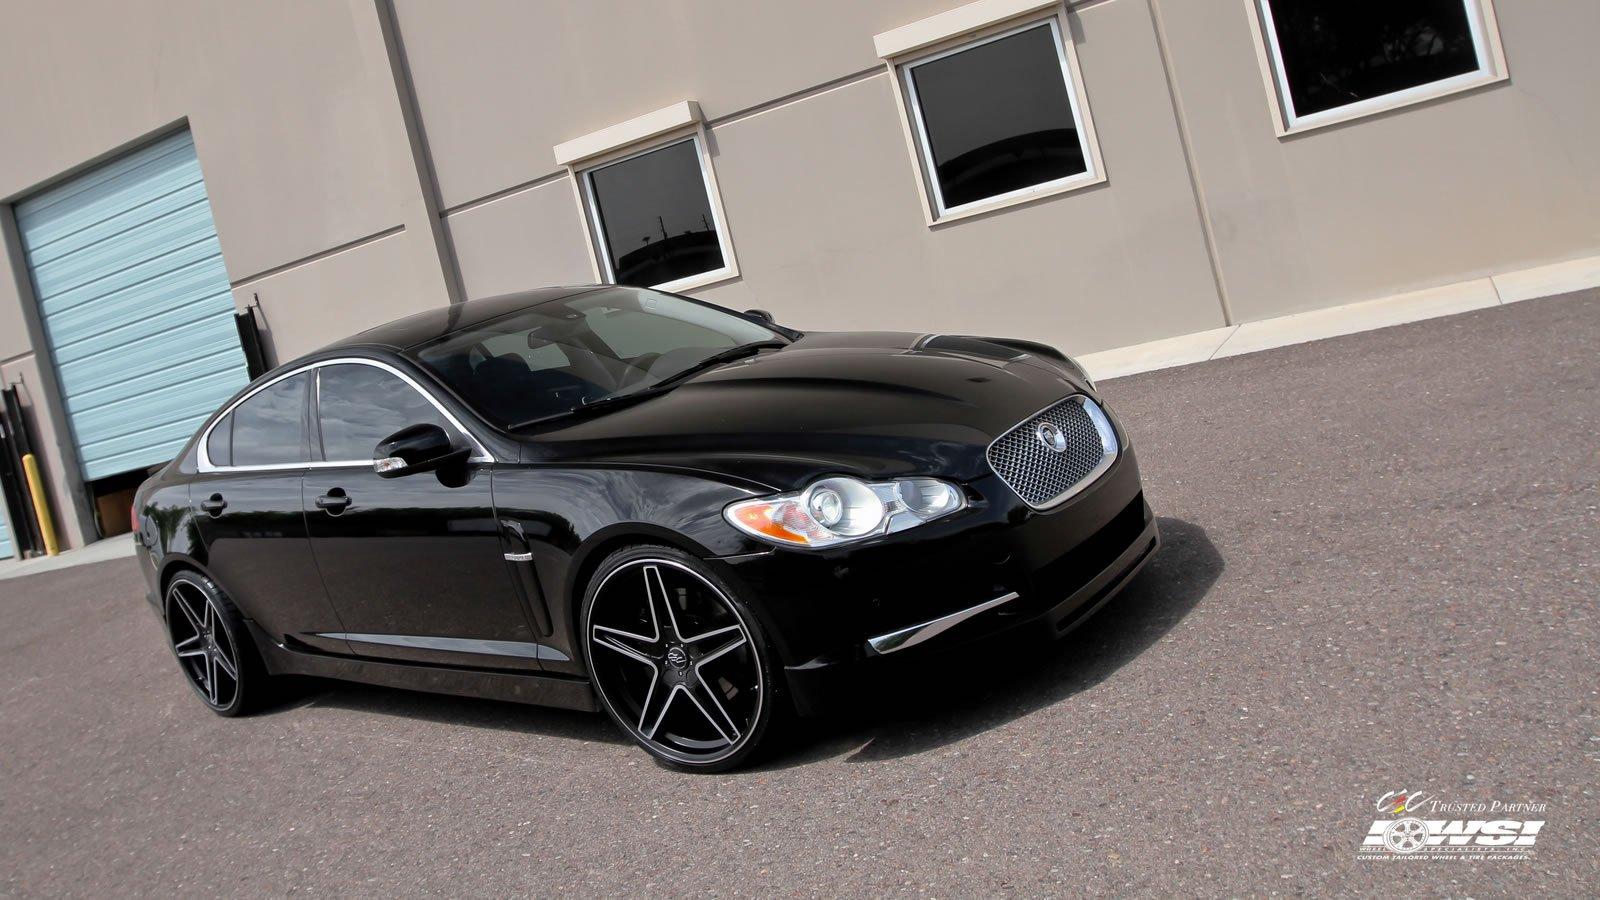 2015 cars cec jaguar xf sedan tuning wheels wallpaper 1600x900 625516 wallpaperup. Black Bedroom Furniture Sets. Home Design Ideas